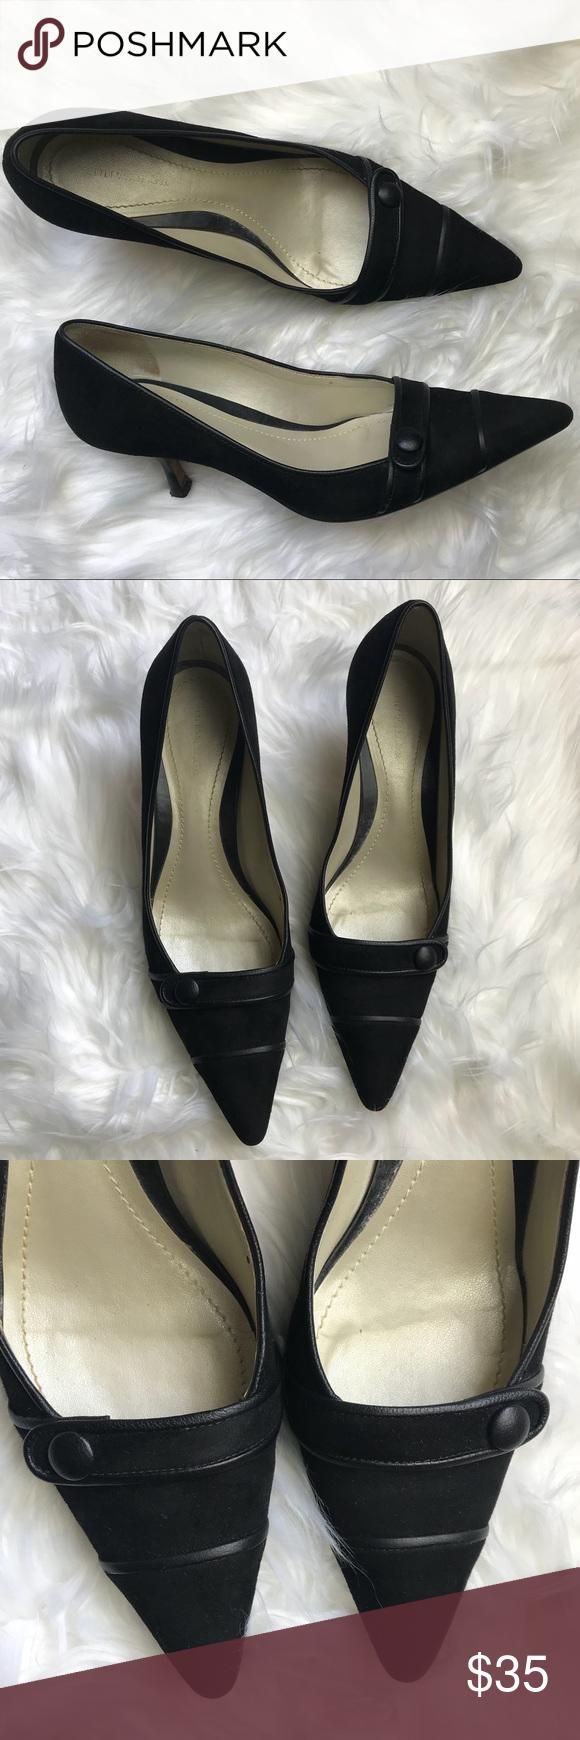 Ann Taylor Black Pointed Toe Suede Kitten Heels 8 Kitten Heels Heels Suede